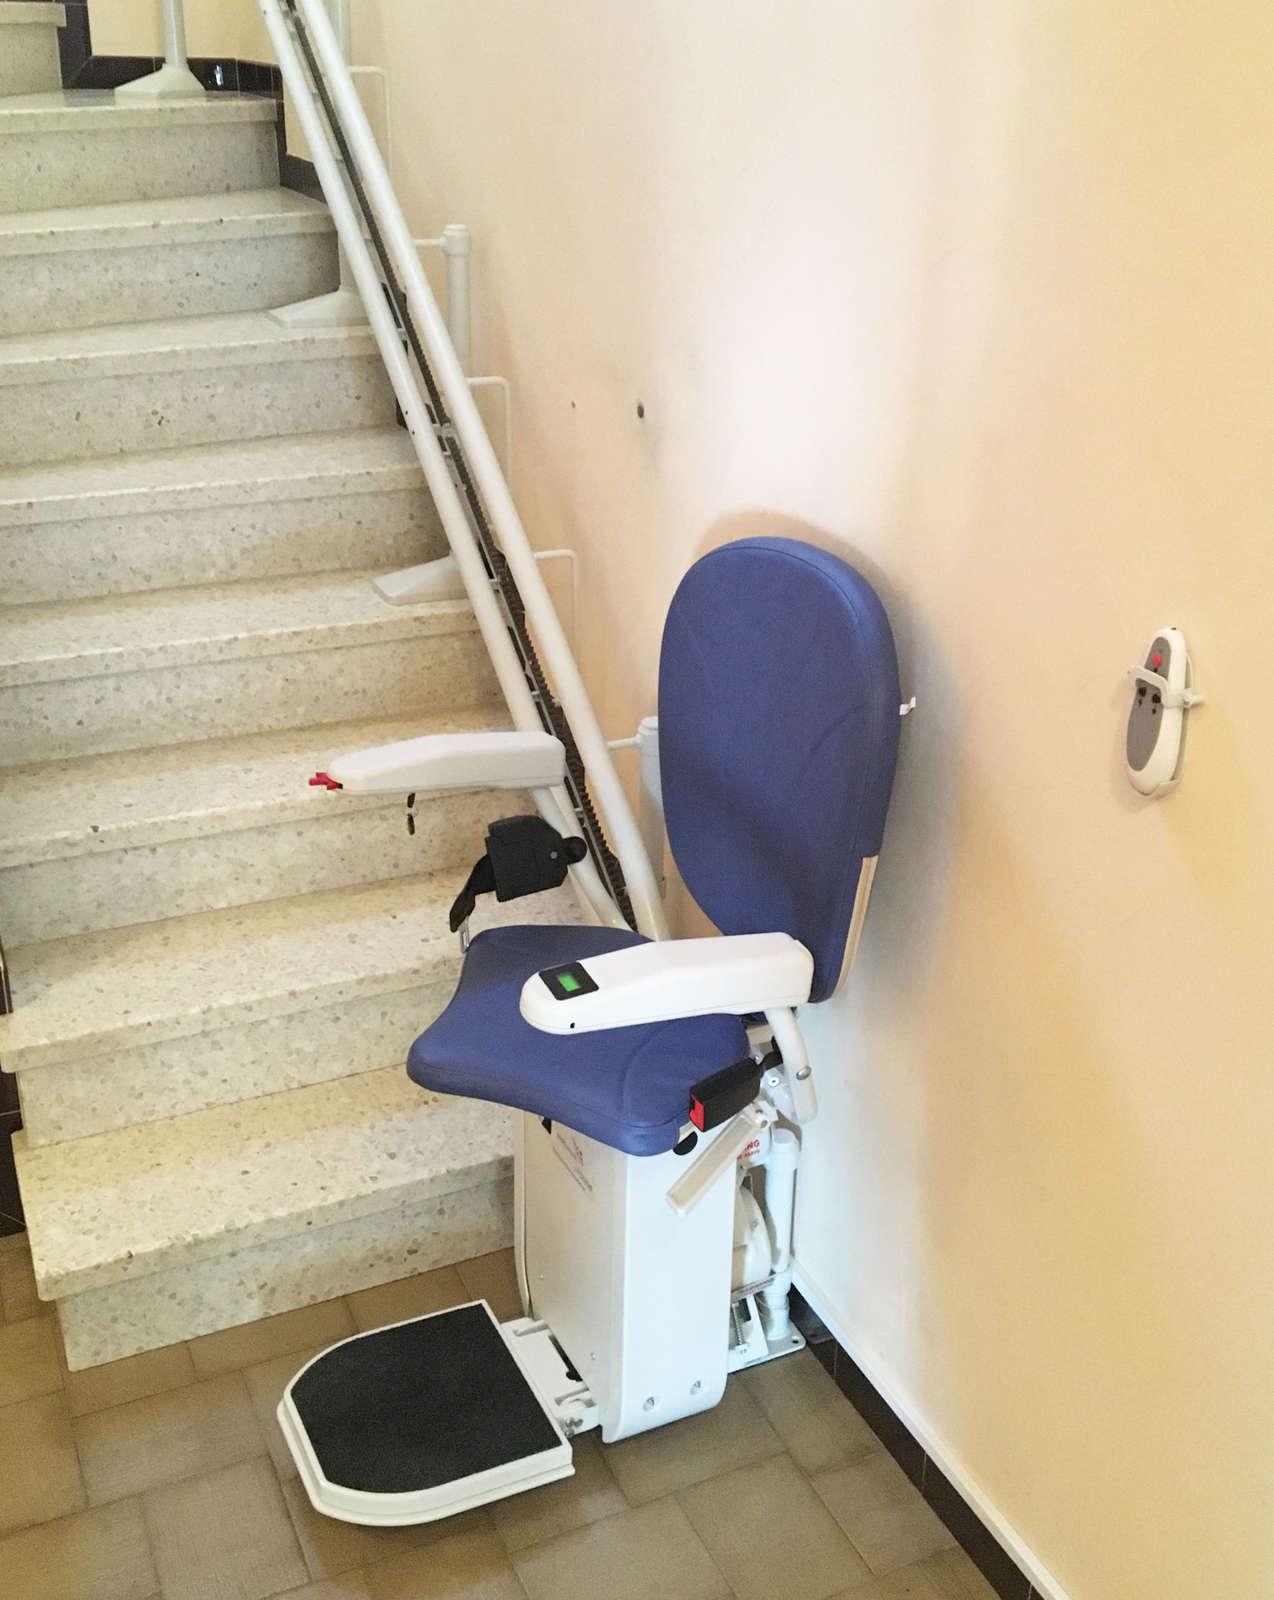 chaise monte escaliers curve tournant eurre sma. Black Bedroom Furniture Sets. Home Design Ideas